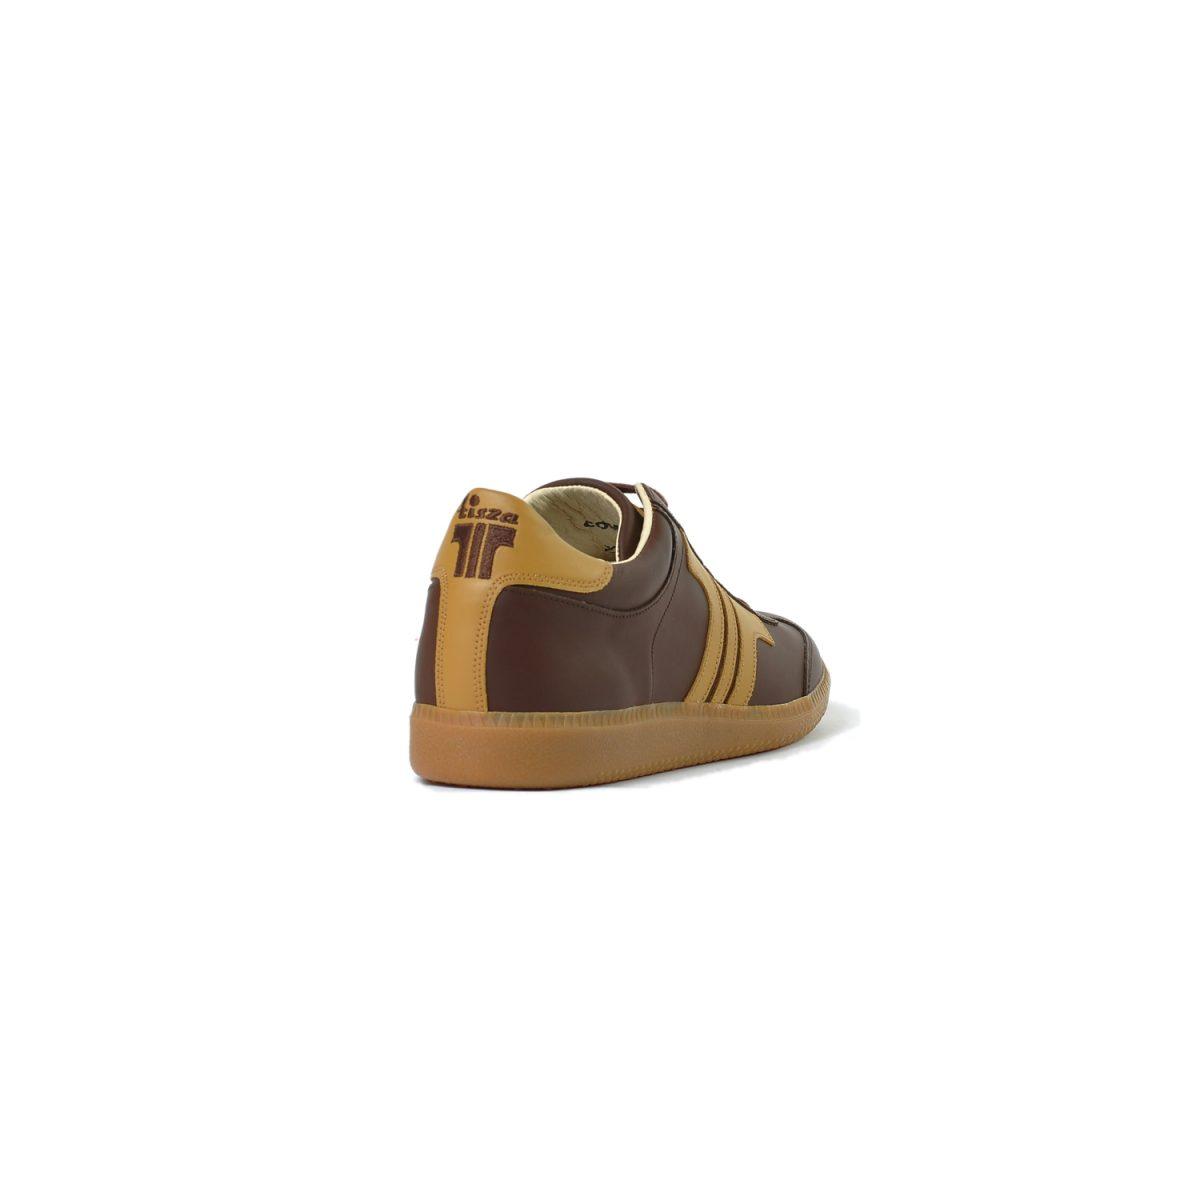 Tisza cipő - Compakt - Barna-bézs